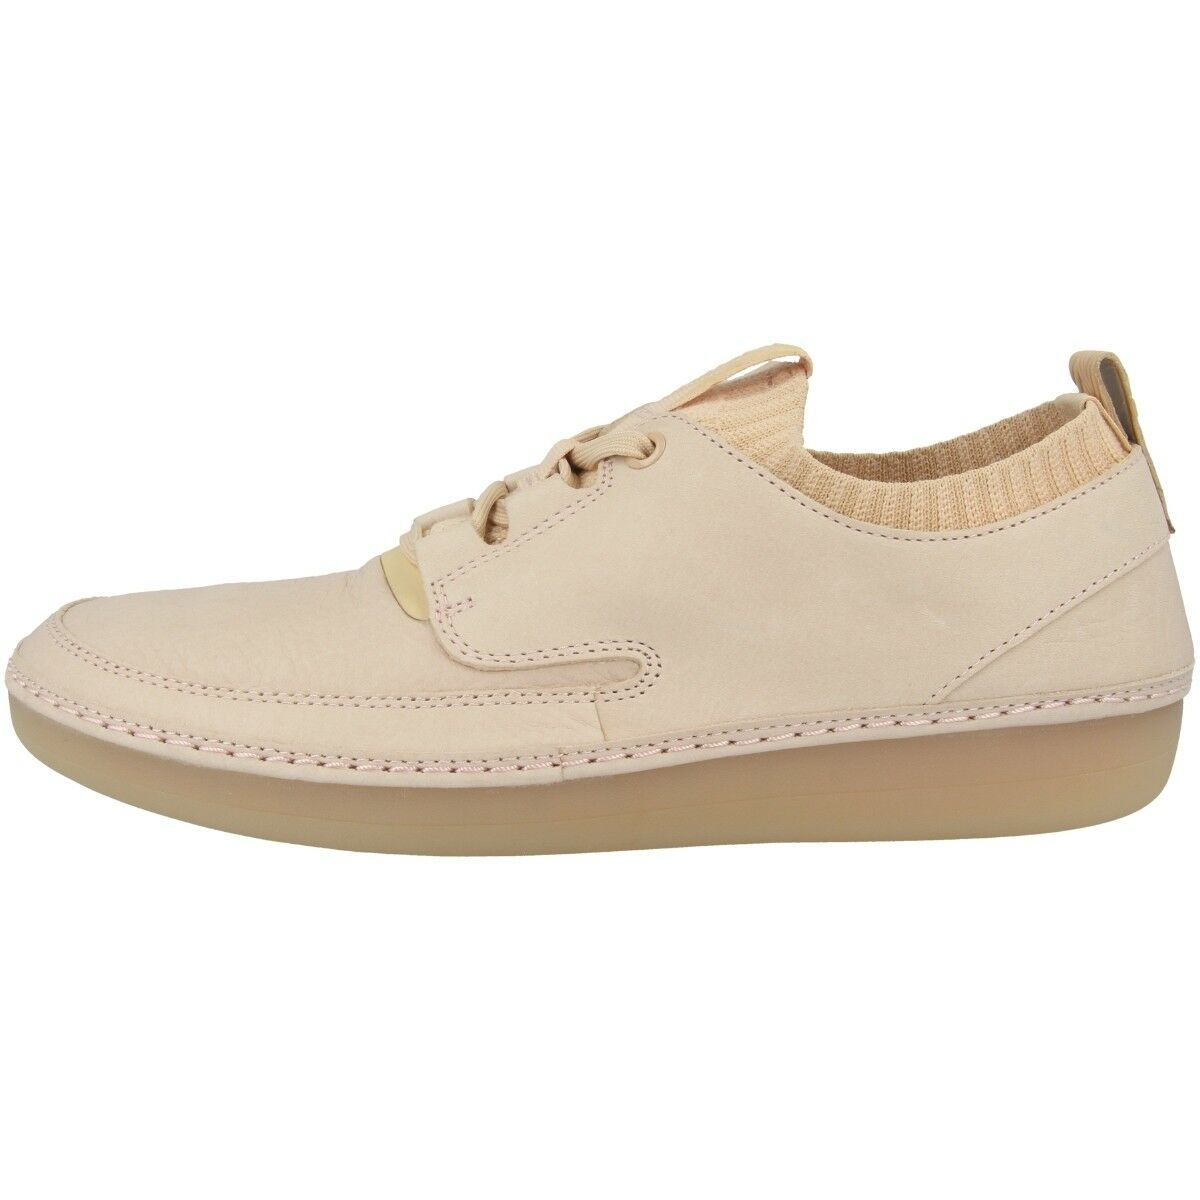 Zapatos promocionales para hombres y mujeres Clarks Nature IV Schuhe Damen Freizeit Leder Schnürschuh Sneaker nude 26131019